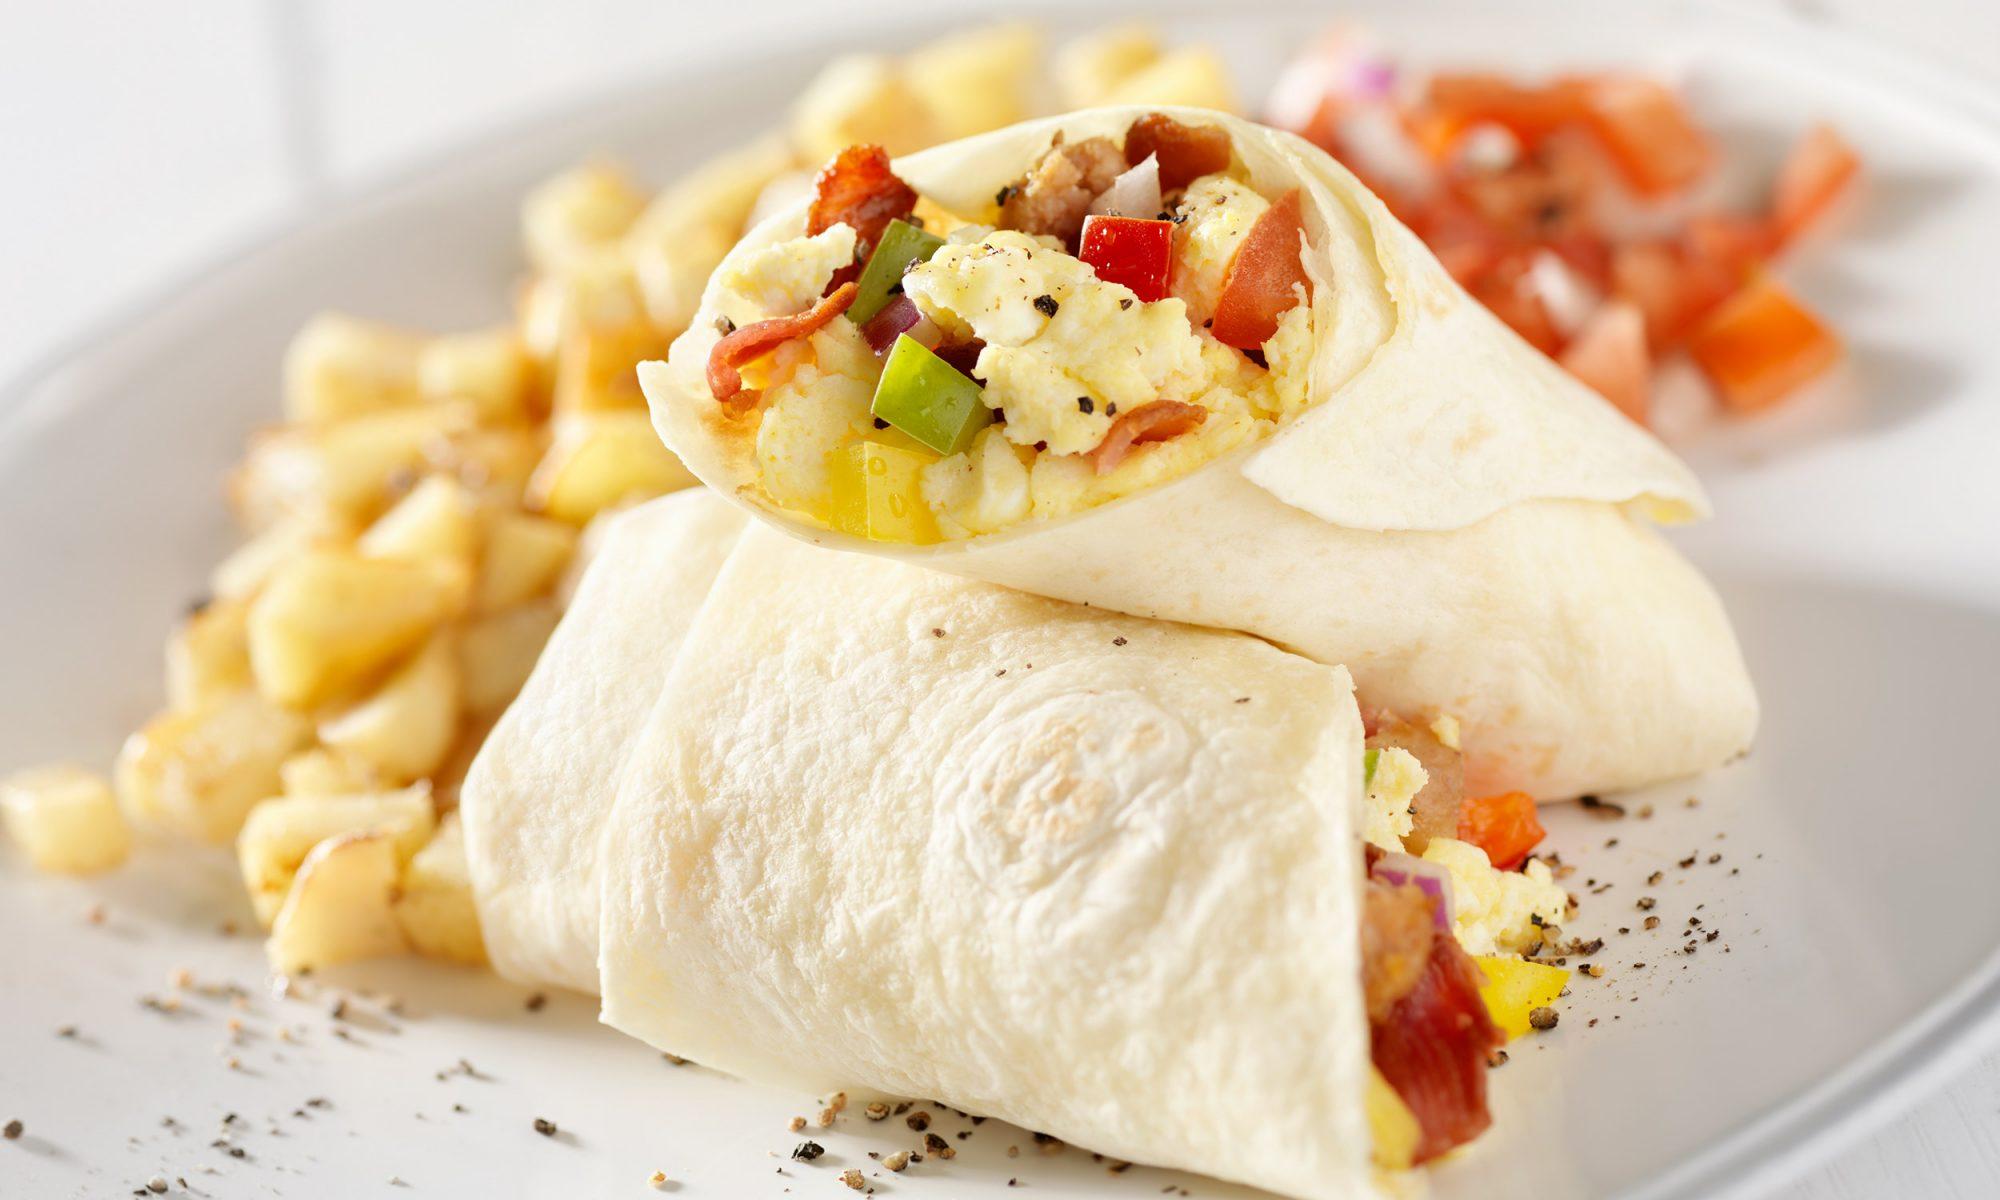 EC: 8 Easy Make-Ahead Breakfasts That Make Mornings a Breeze